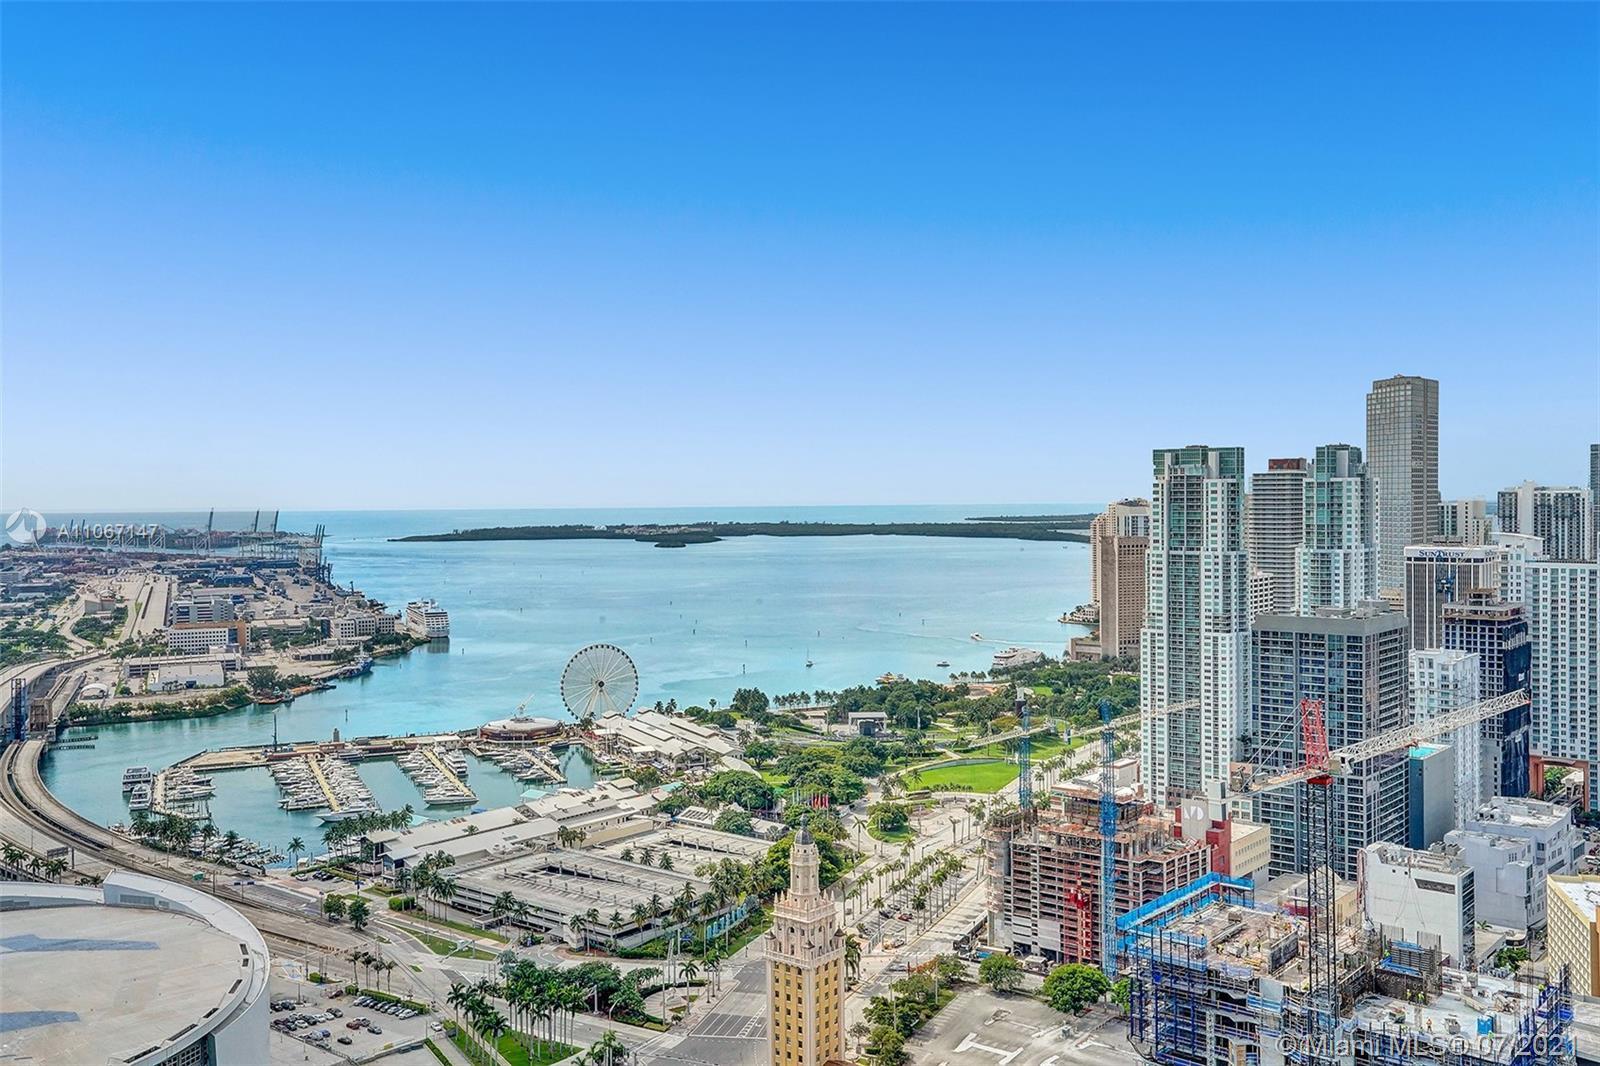 Paramount Miami Worldcenter #4405 - 01 - photo